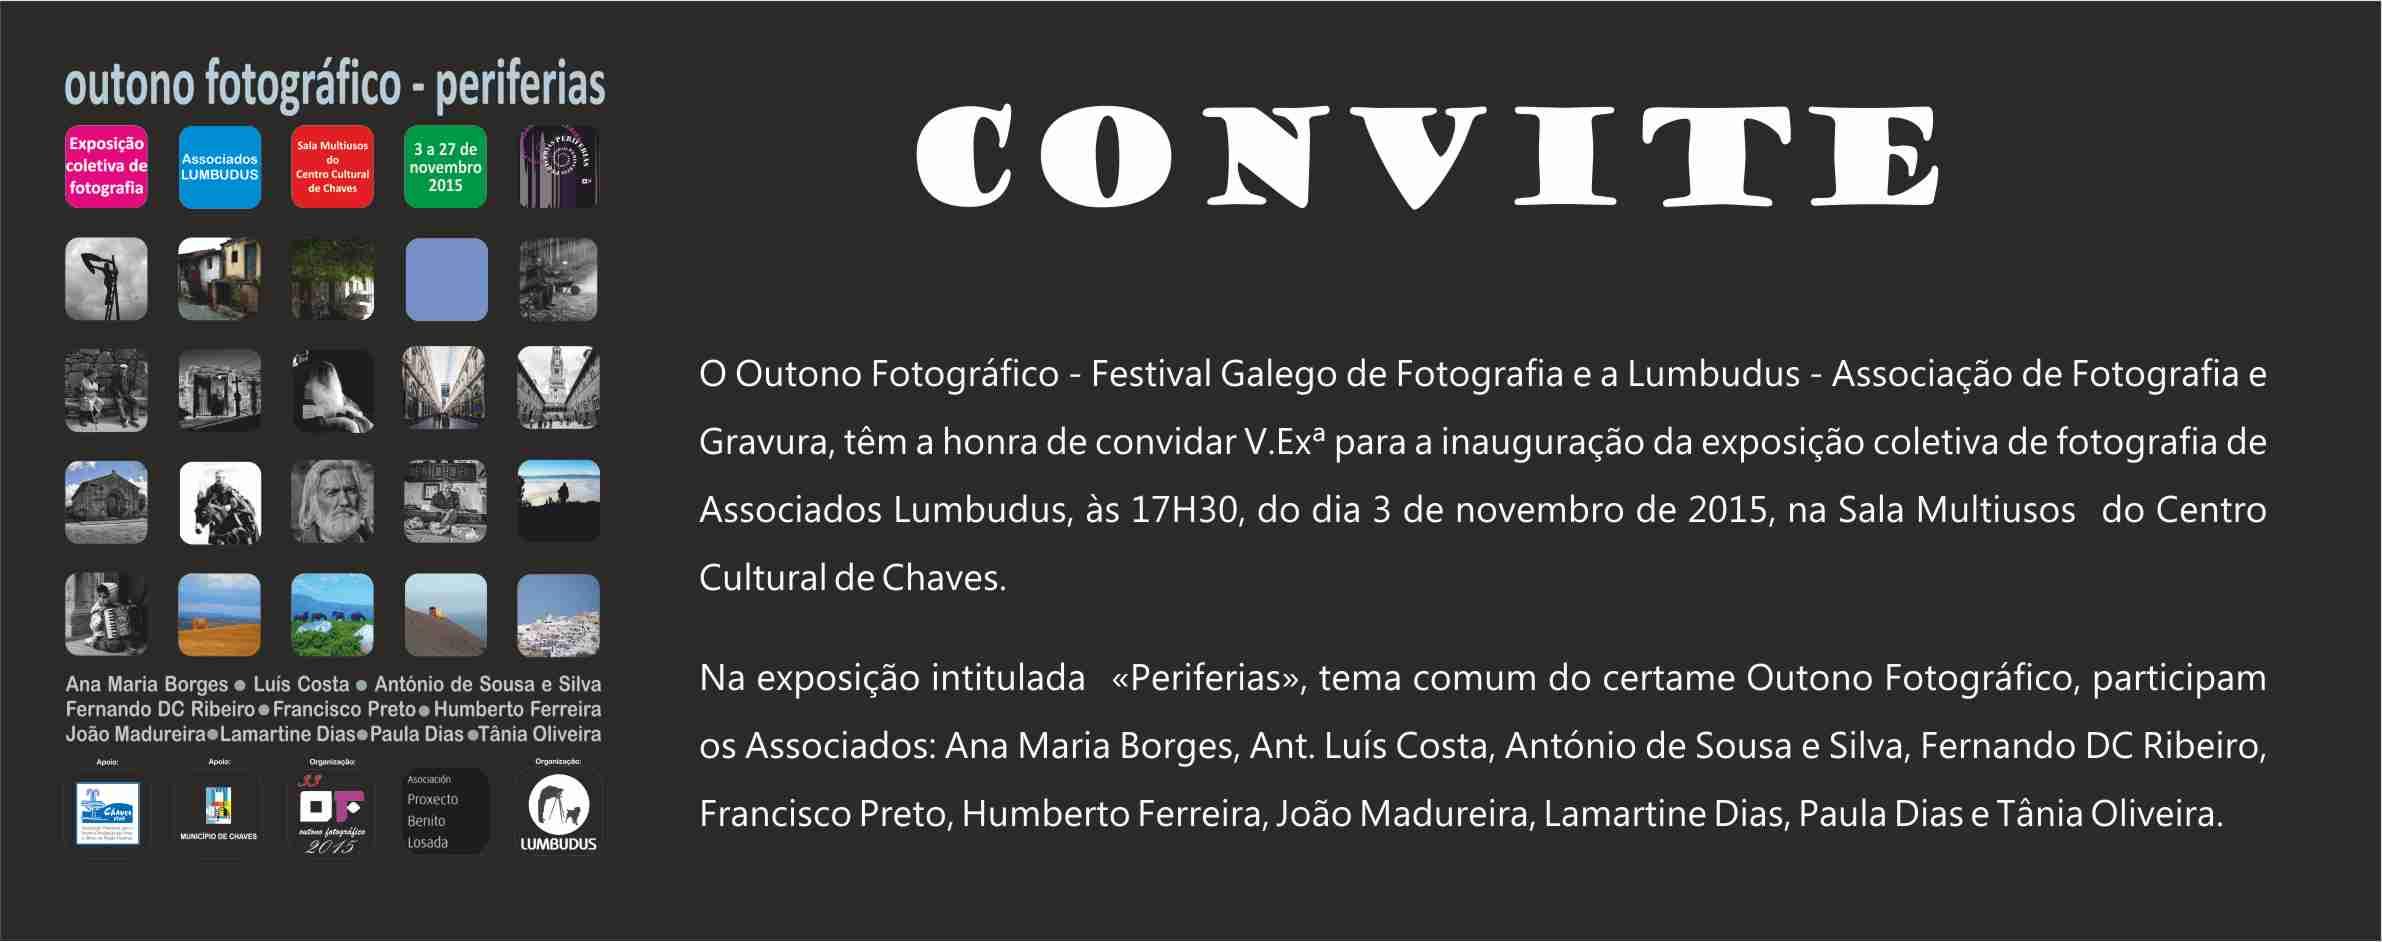 convite-clot.jpg